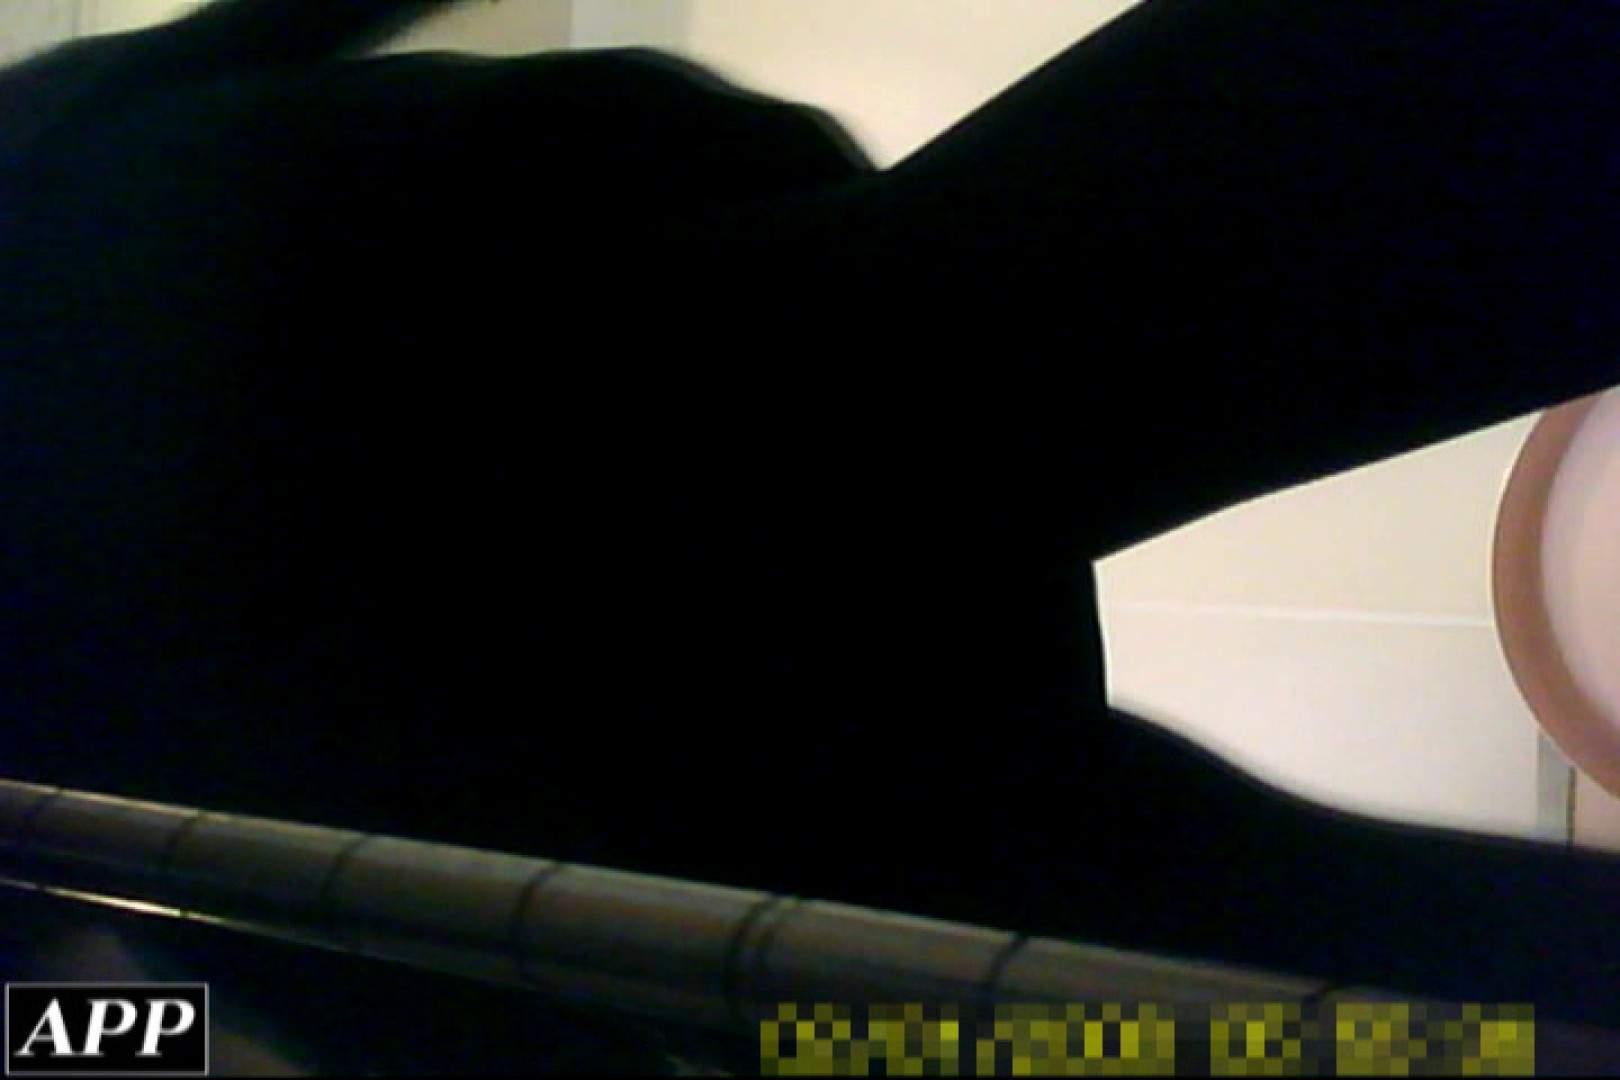 3視点洗面所 vol.091 独身エッチOL | 洗面所  68pic 14